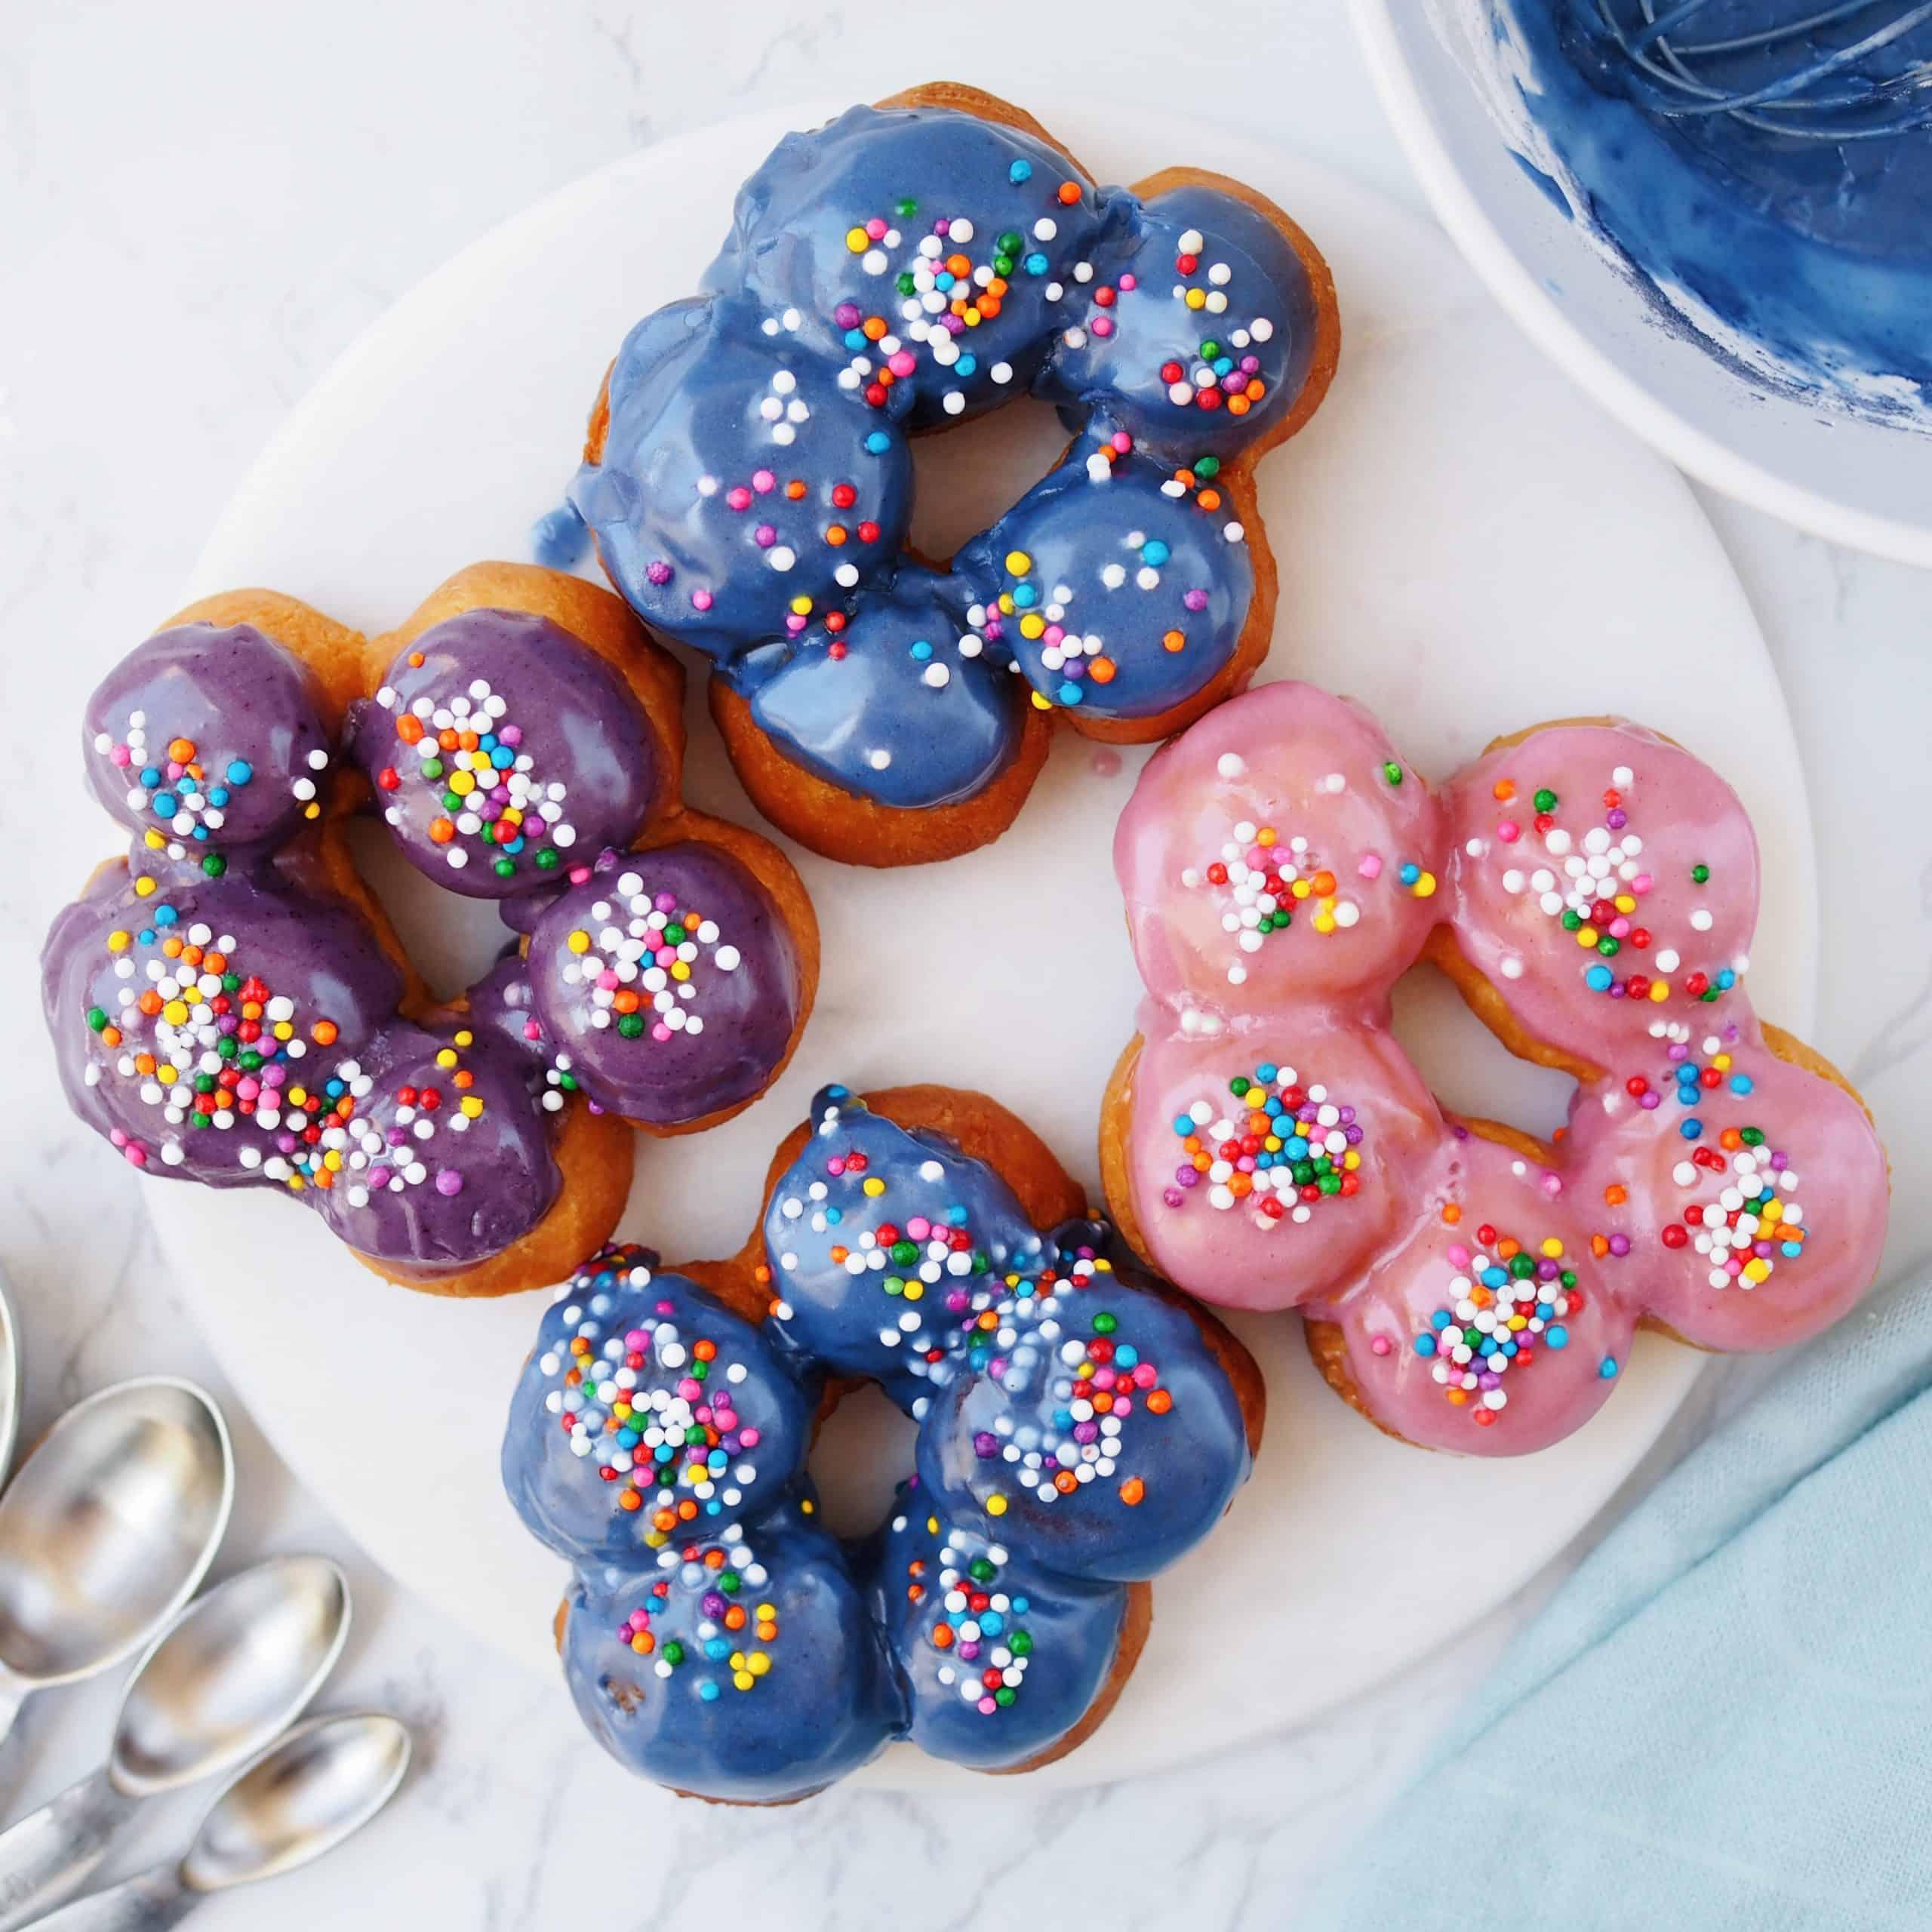 japanese mochi donuts